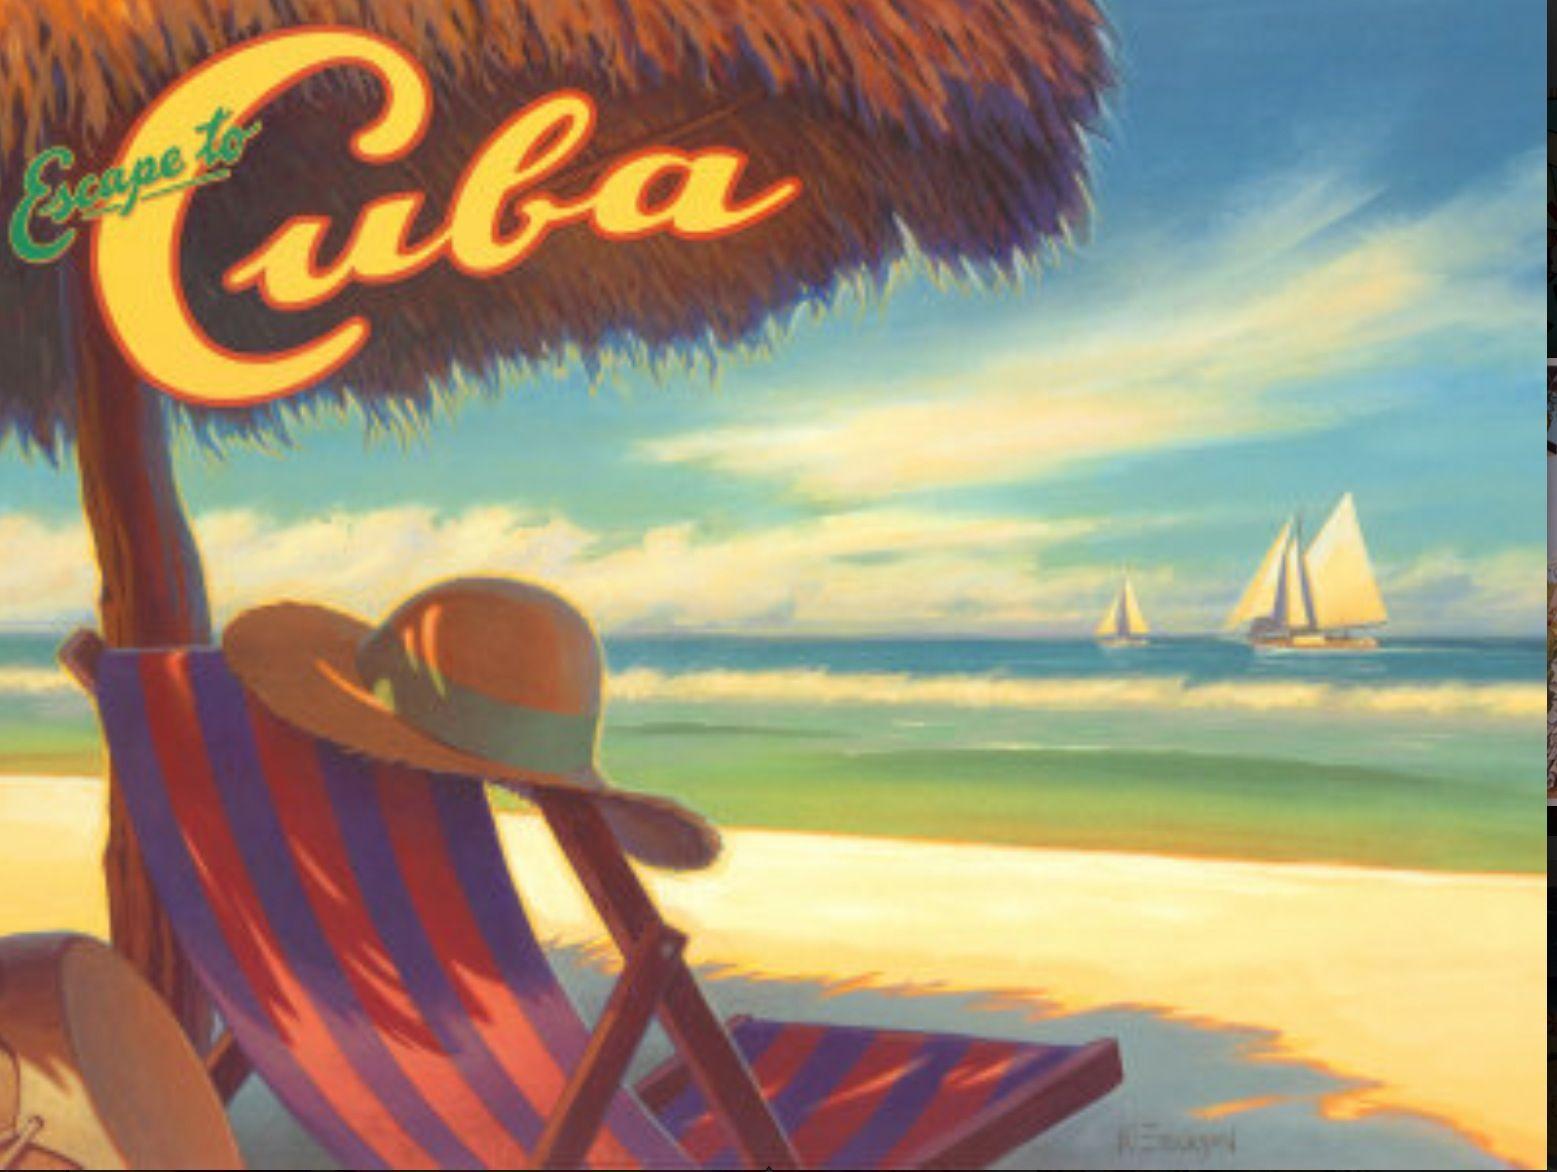 Vintage travel poster. | Cuba | Pinterest | Travel posters, Vintage ...